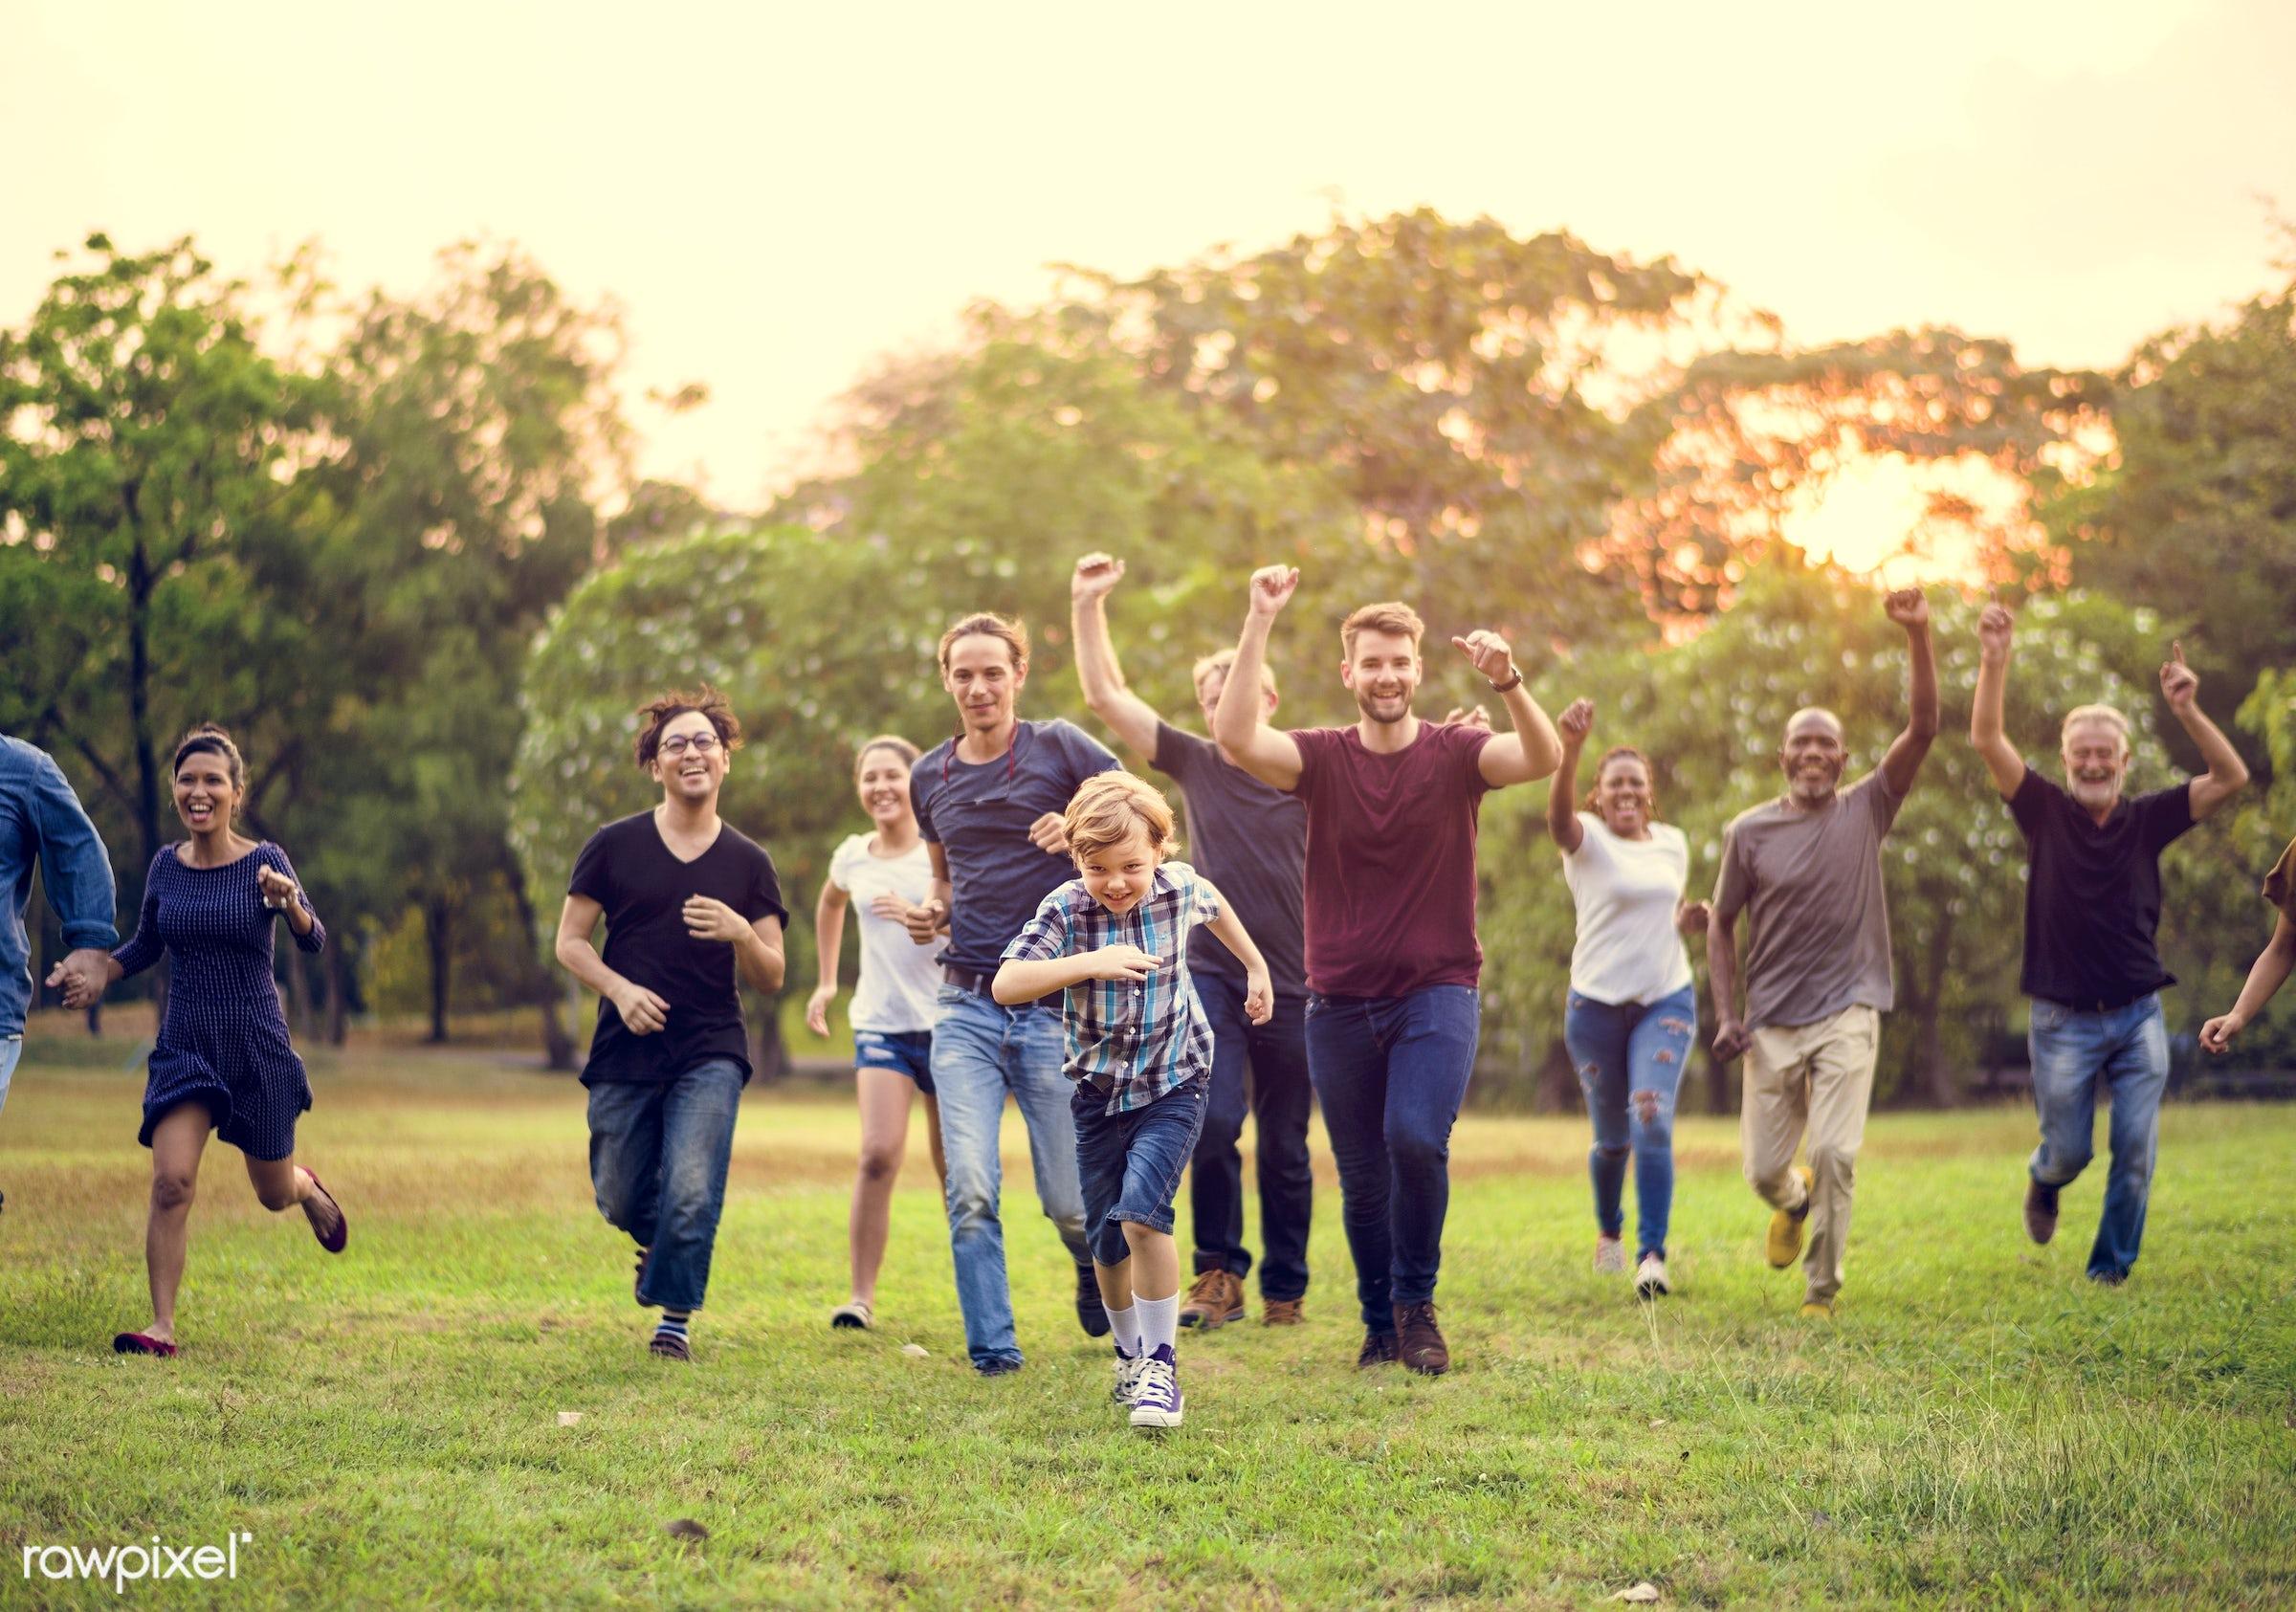 countryside, diverse, volunteer, cultures, bonding, neighbor, people, running, positivity, kid, friends, tree, nature, woman...